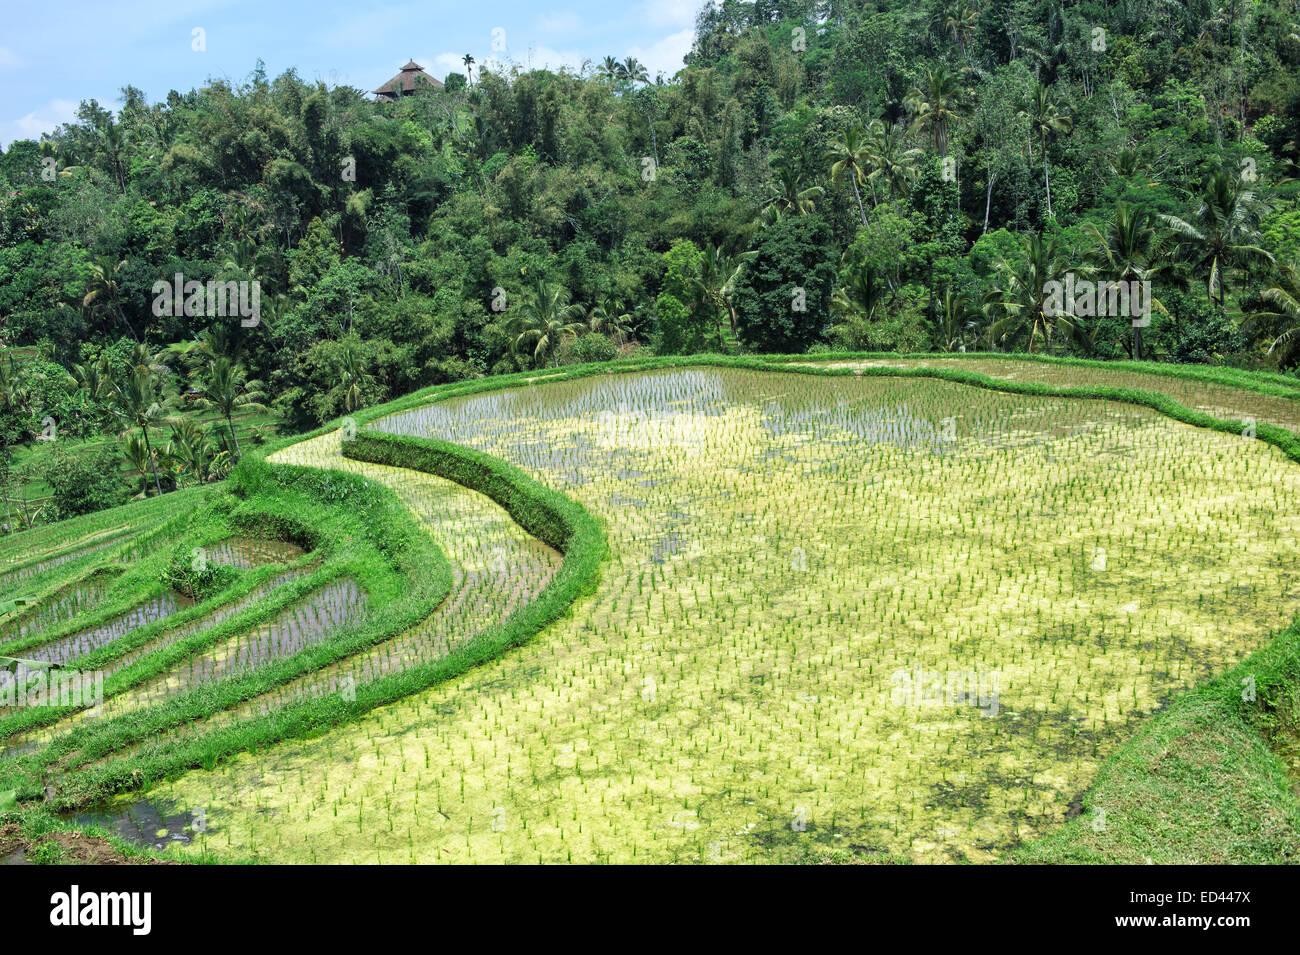 Batukau rice fields, Bali, Indonesia Stock Photo